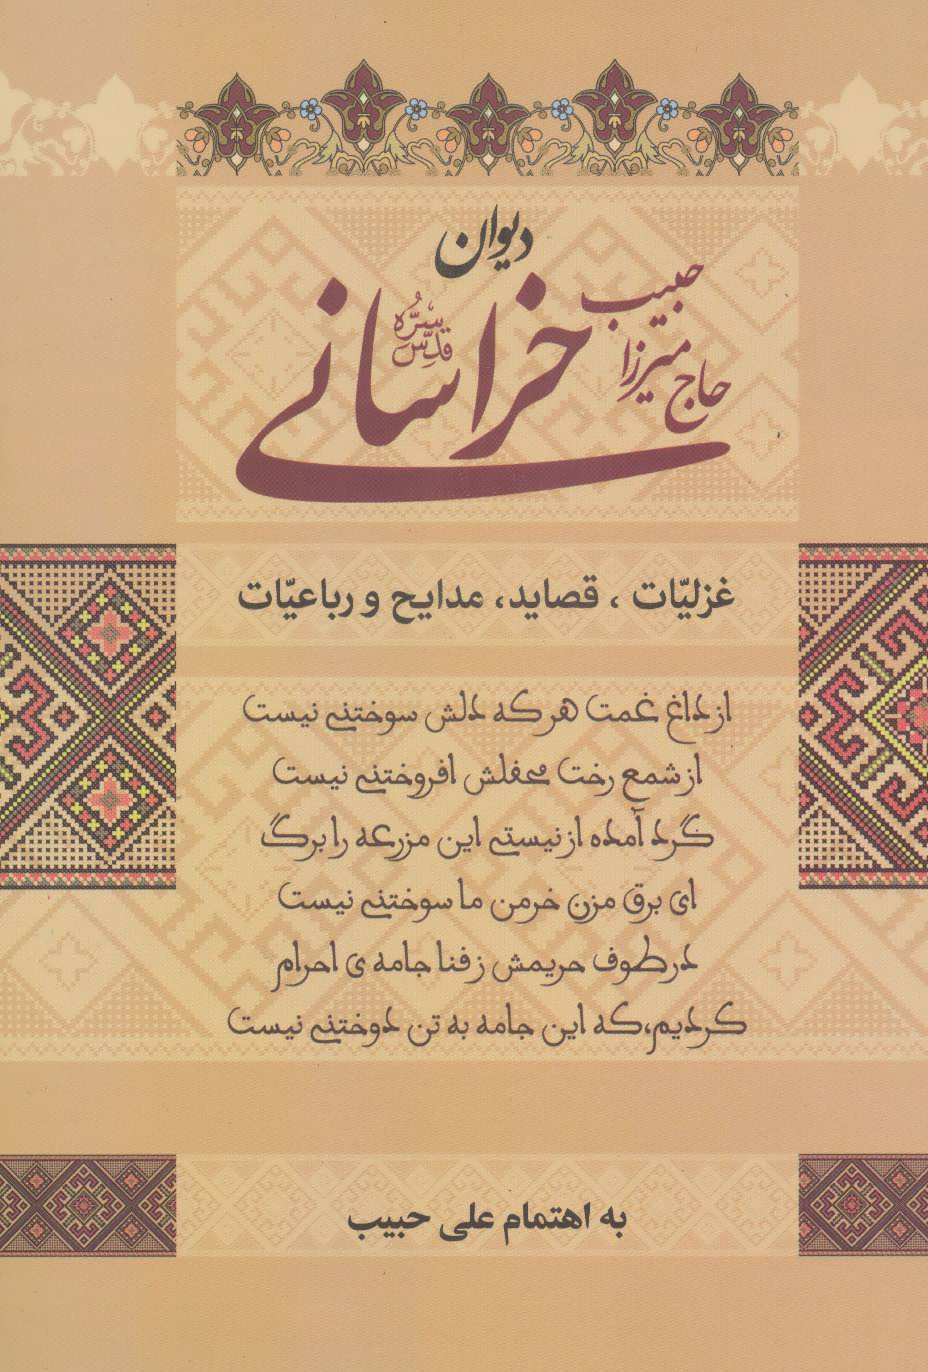 کتاب دیوان حاج میرزا حبیب خراسانی